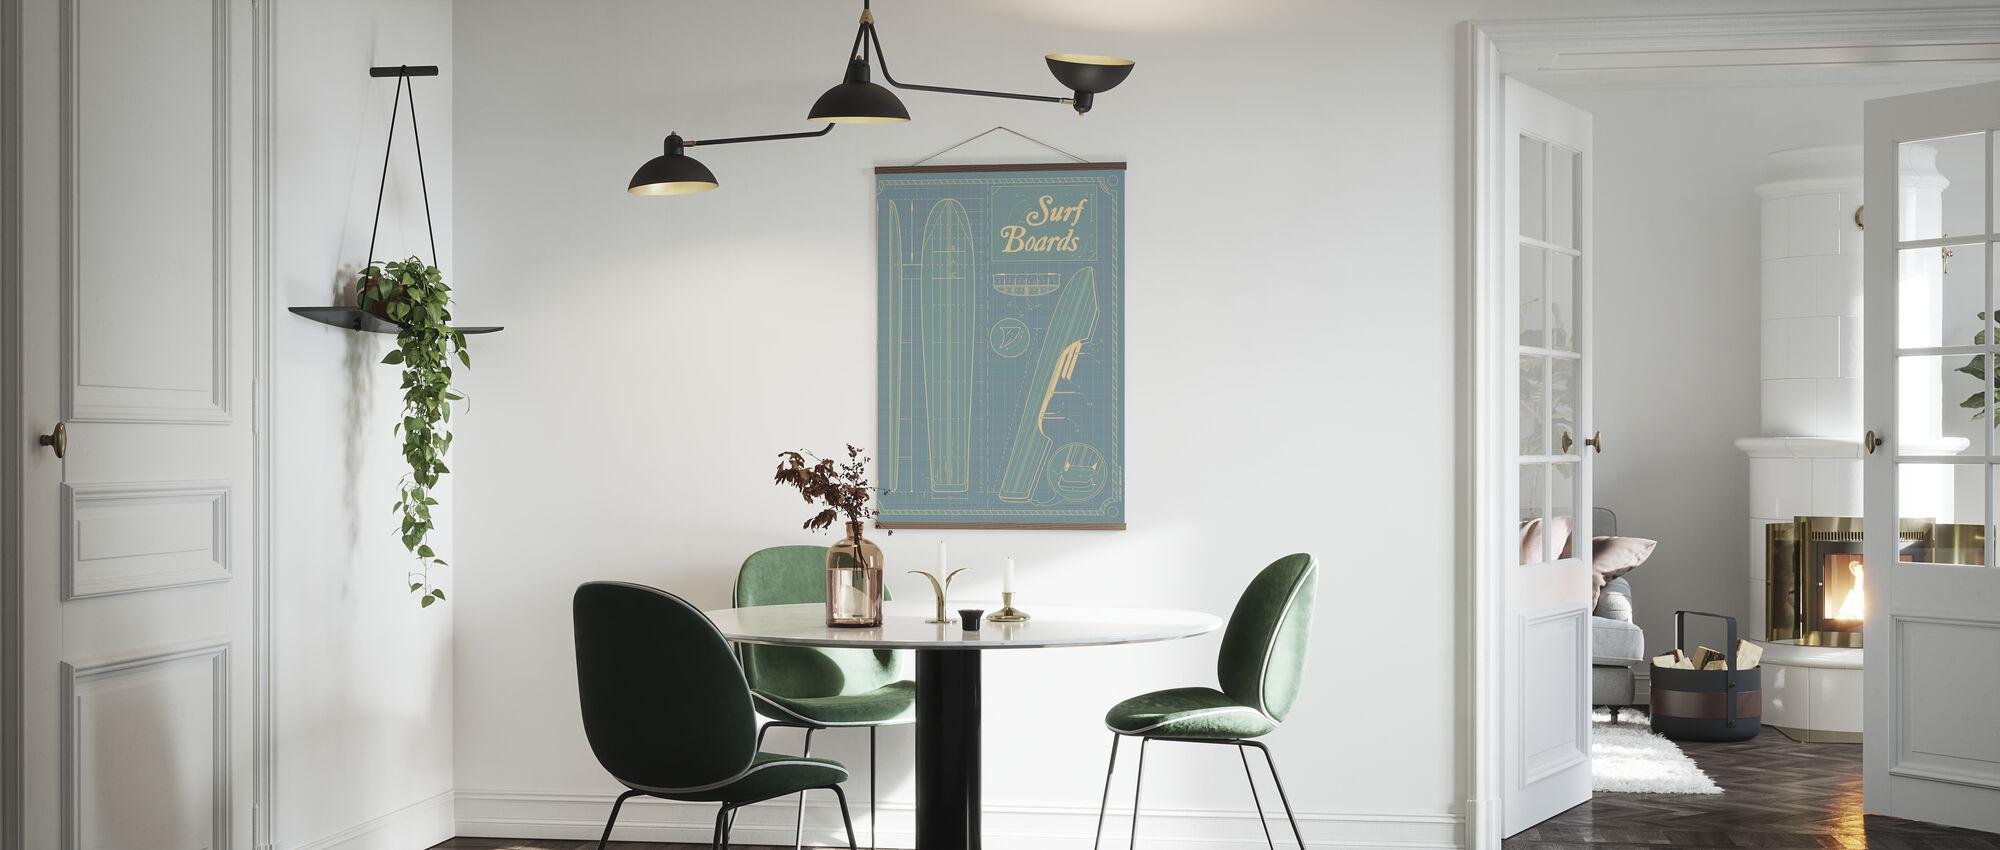 Surfbretter - Poster - Küchen